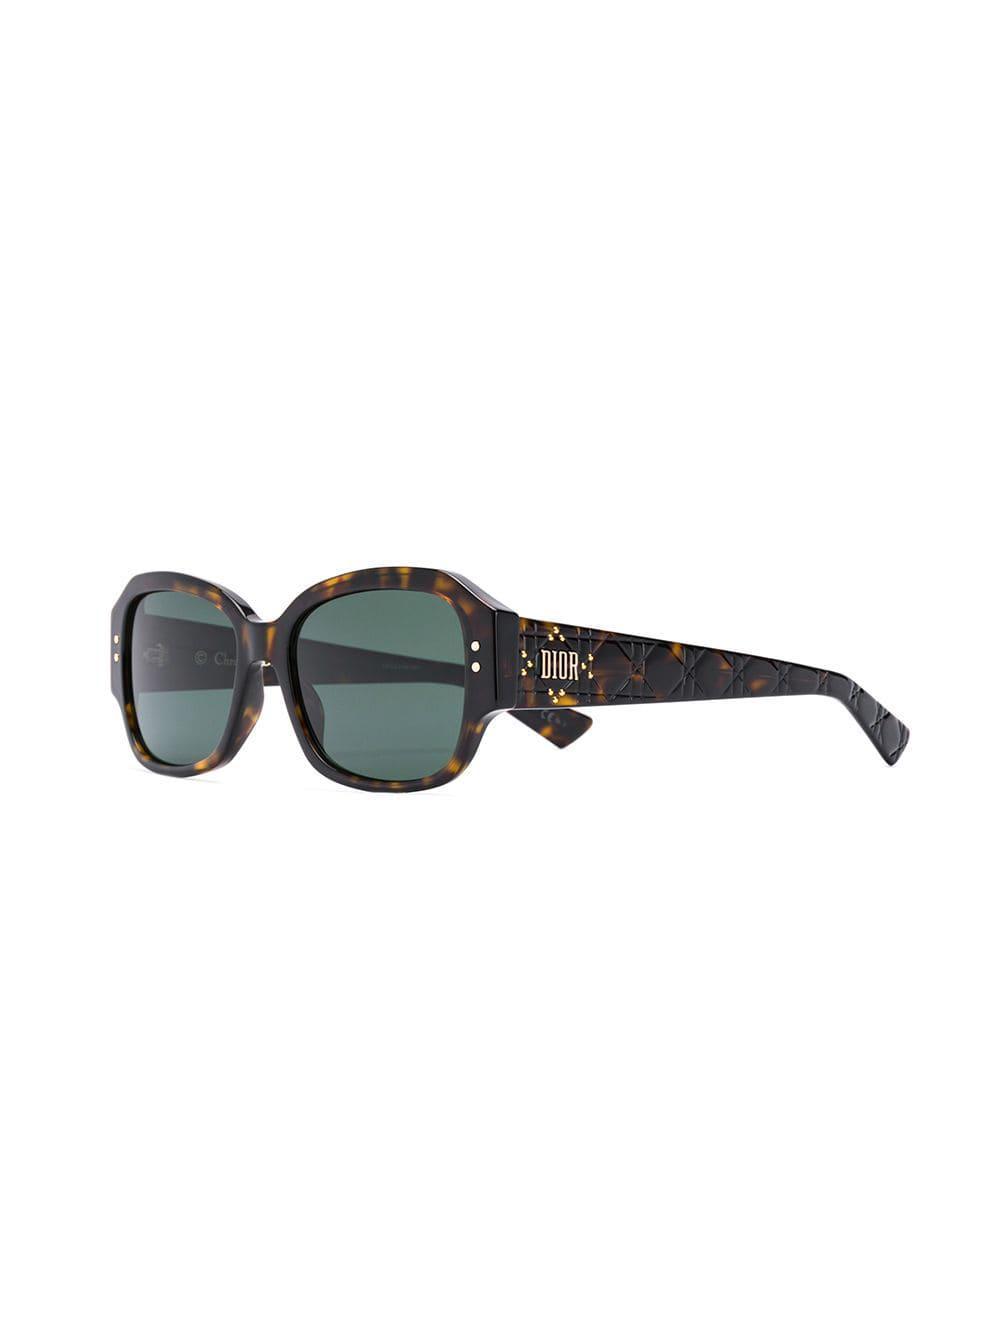 feeaca29f96 ... Dior Stud Sunglasses - Lyst. View fullscreen